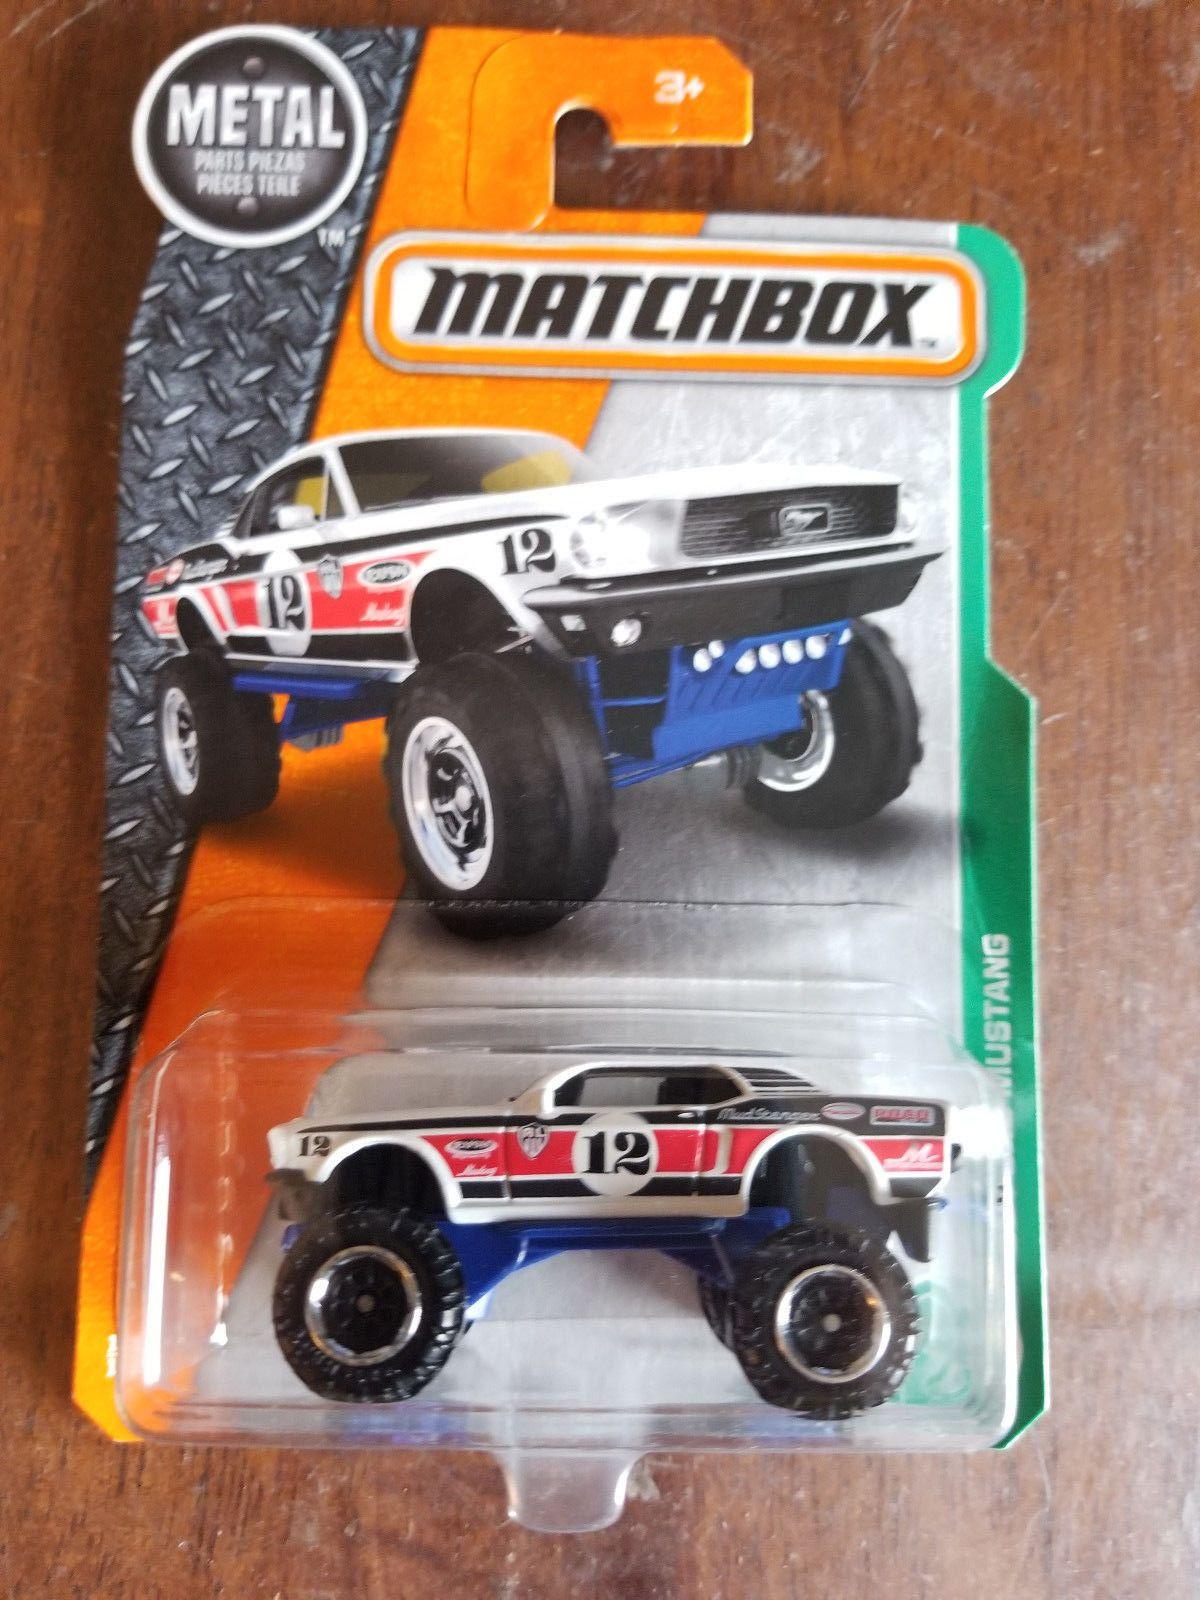 WHITE 2017 Matchbox M Case /'68 Ford Mustang #124 WA11